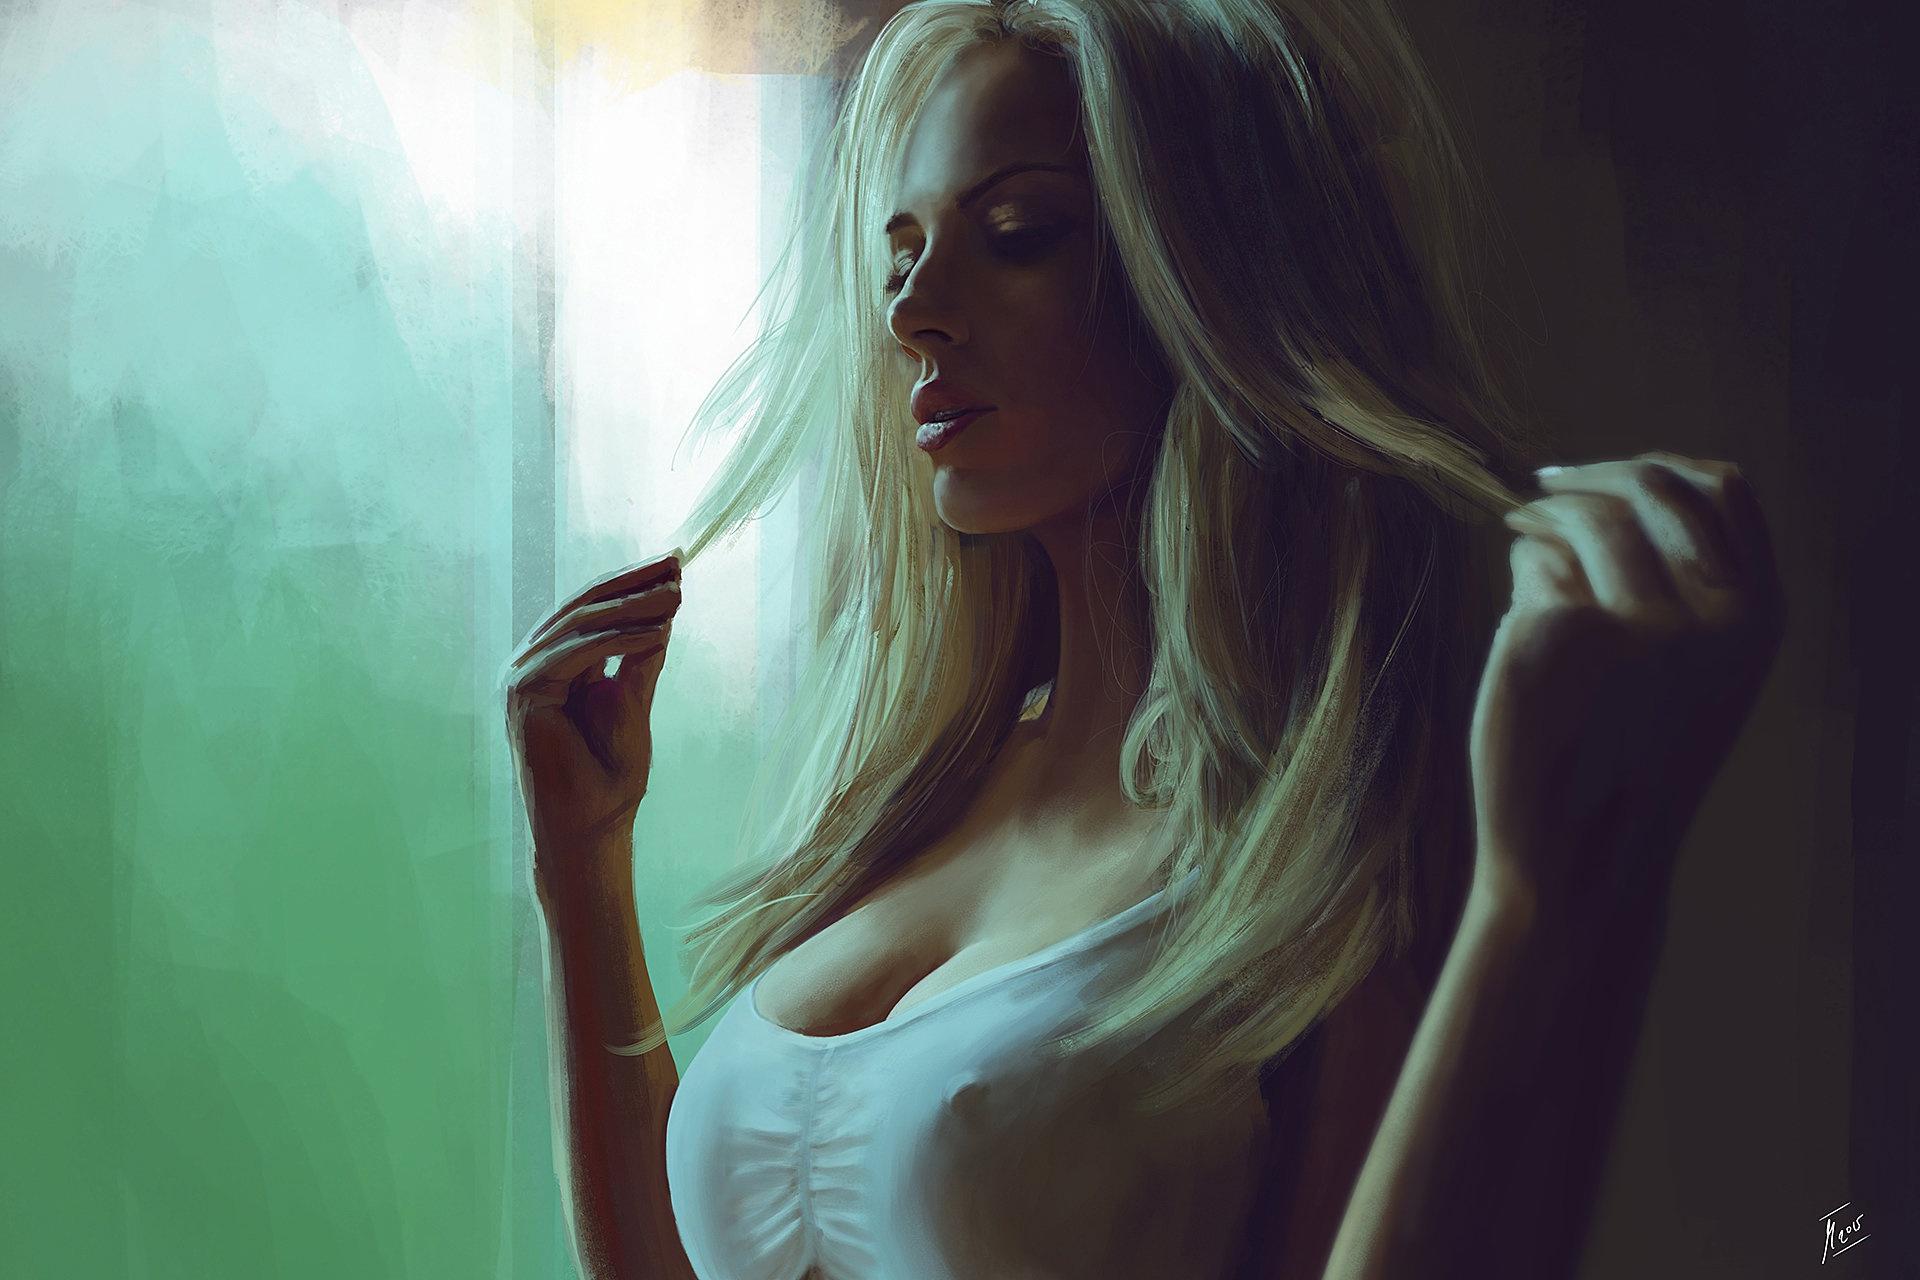 General 1920x1280 Ancilla Tilia women model women indoors artwork blonde boobs big boobs nipples nipples through clothing hair pulling